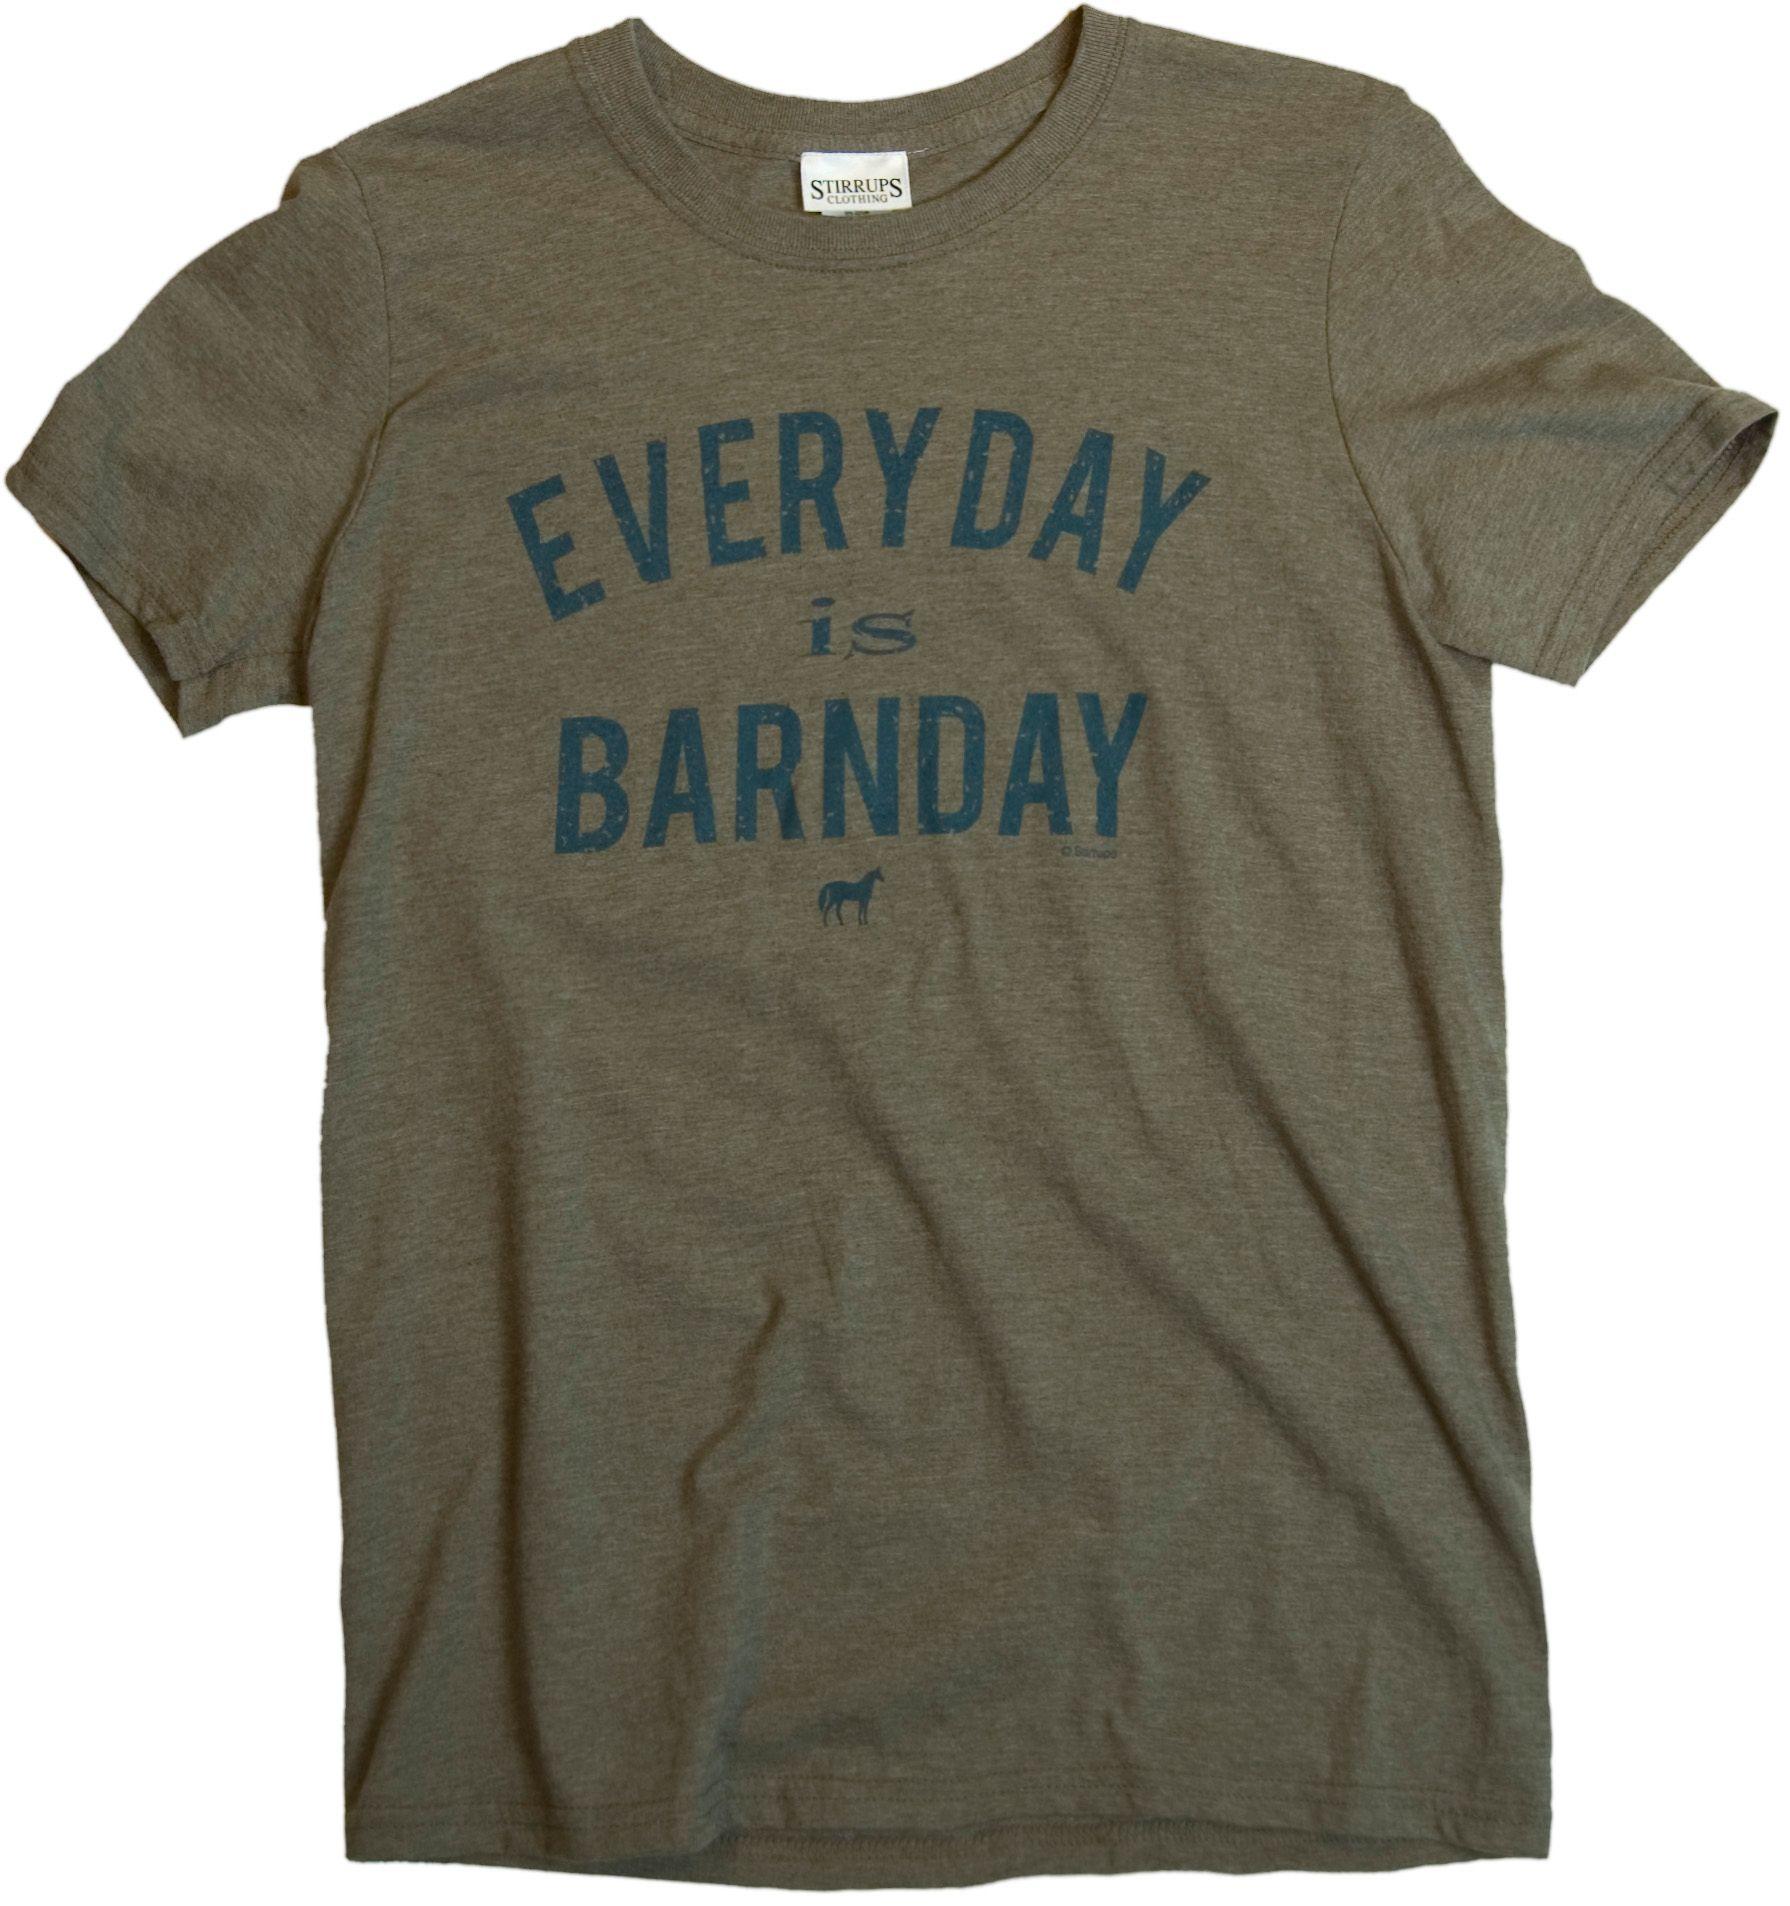 Stirrups Everyday Is Barnday Tee - Unisex